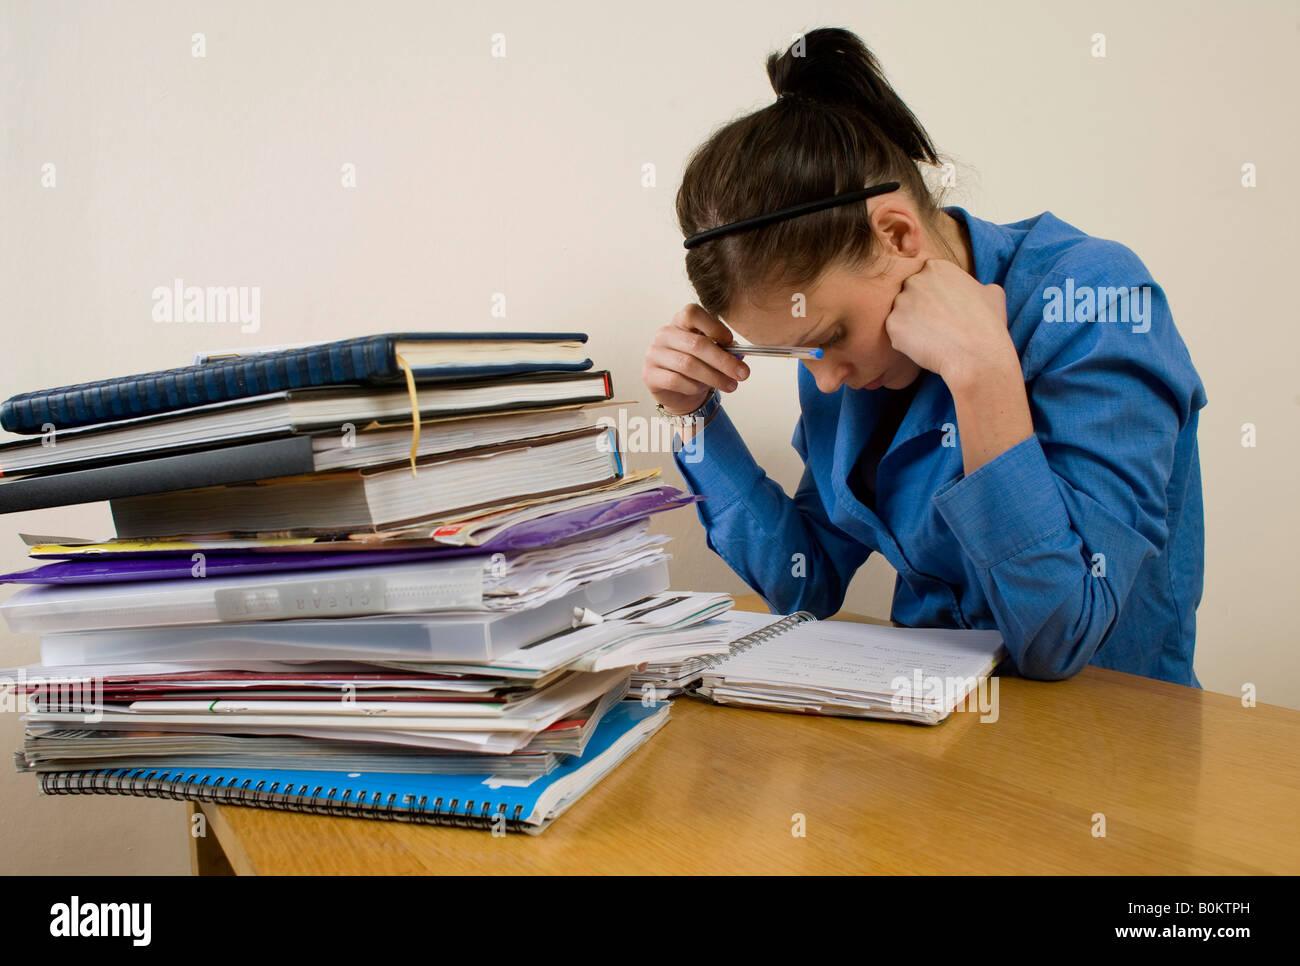 Girl, woman studying for exams - Stock Image